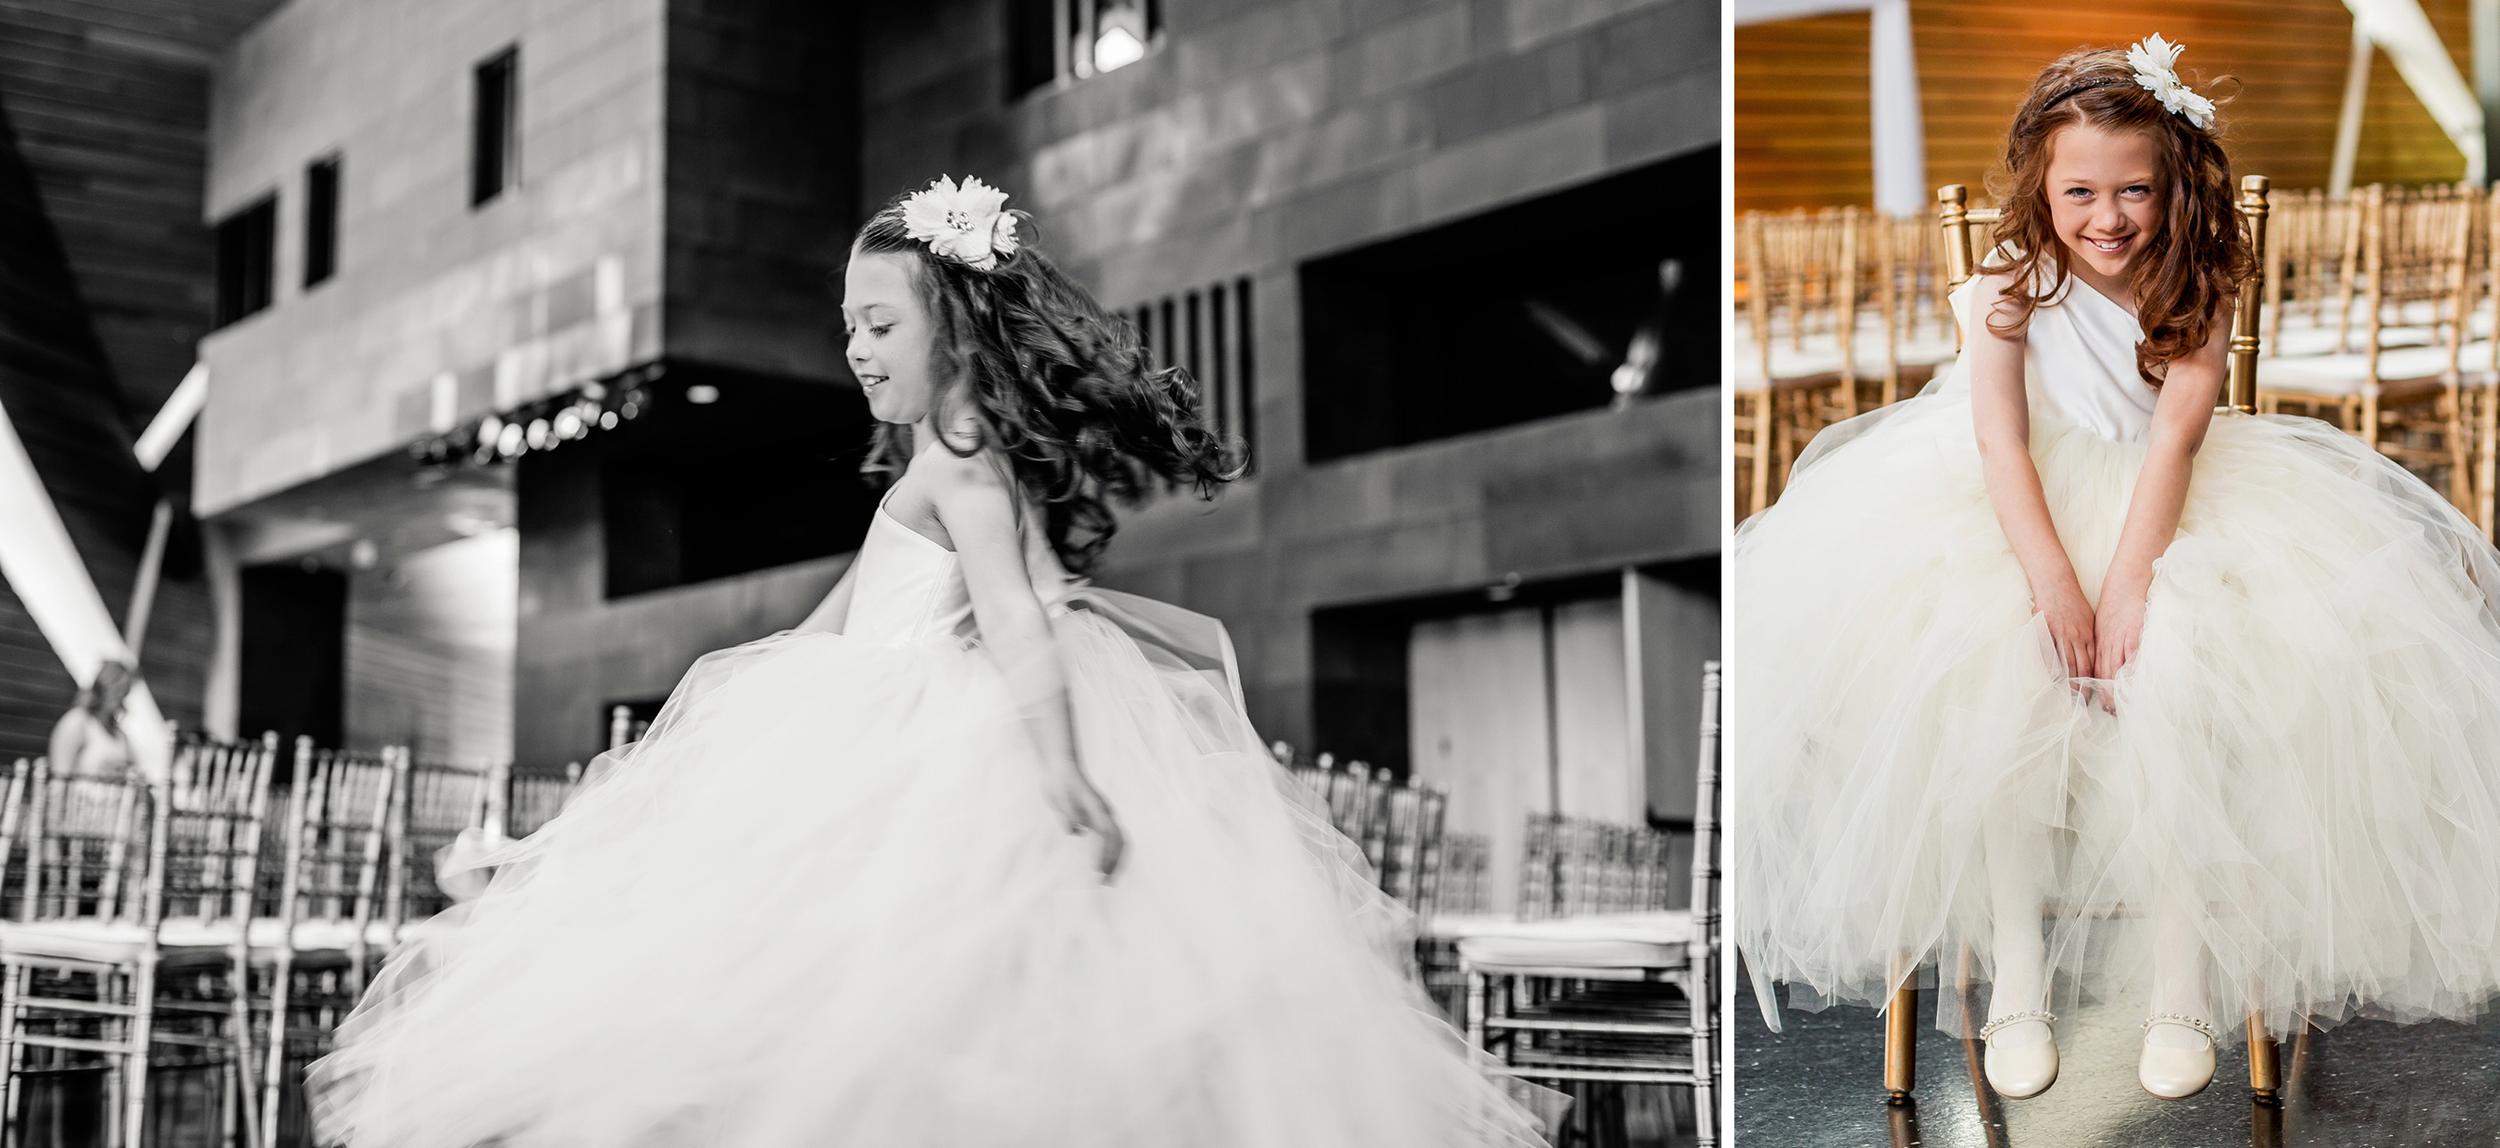 u of m wedding photos mcnamara .jpg